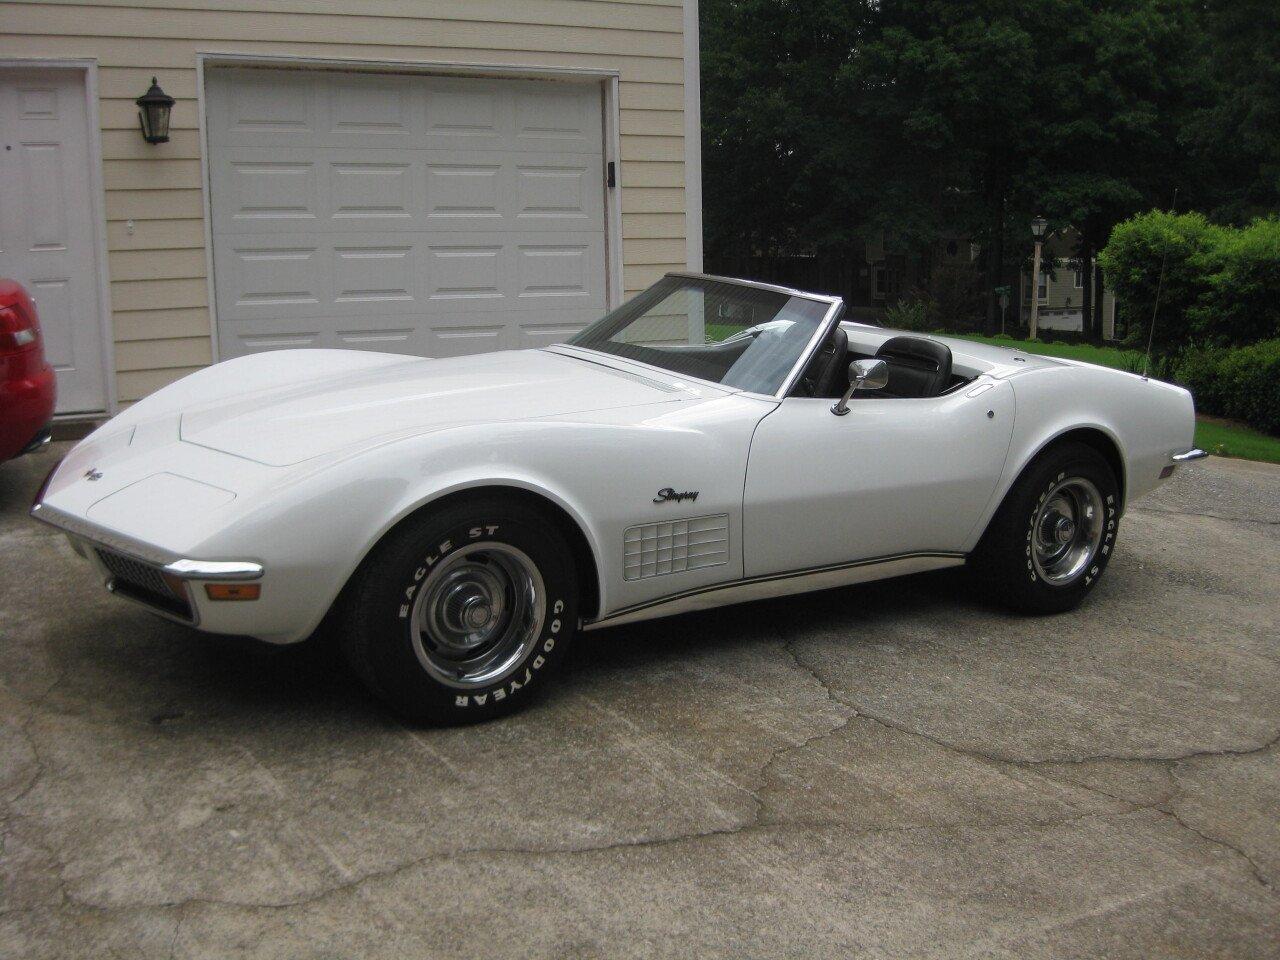 Classic Cars For Sale Auto Trader Com: 1972 Chevrolet Corvette For Sale Near Norcross, Georgia